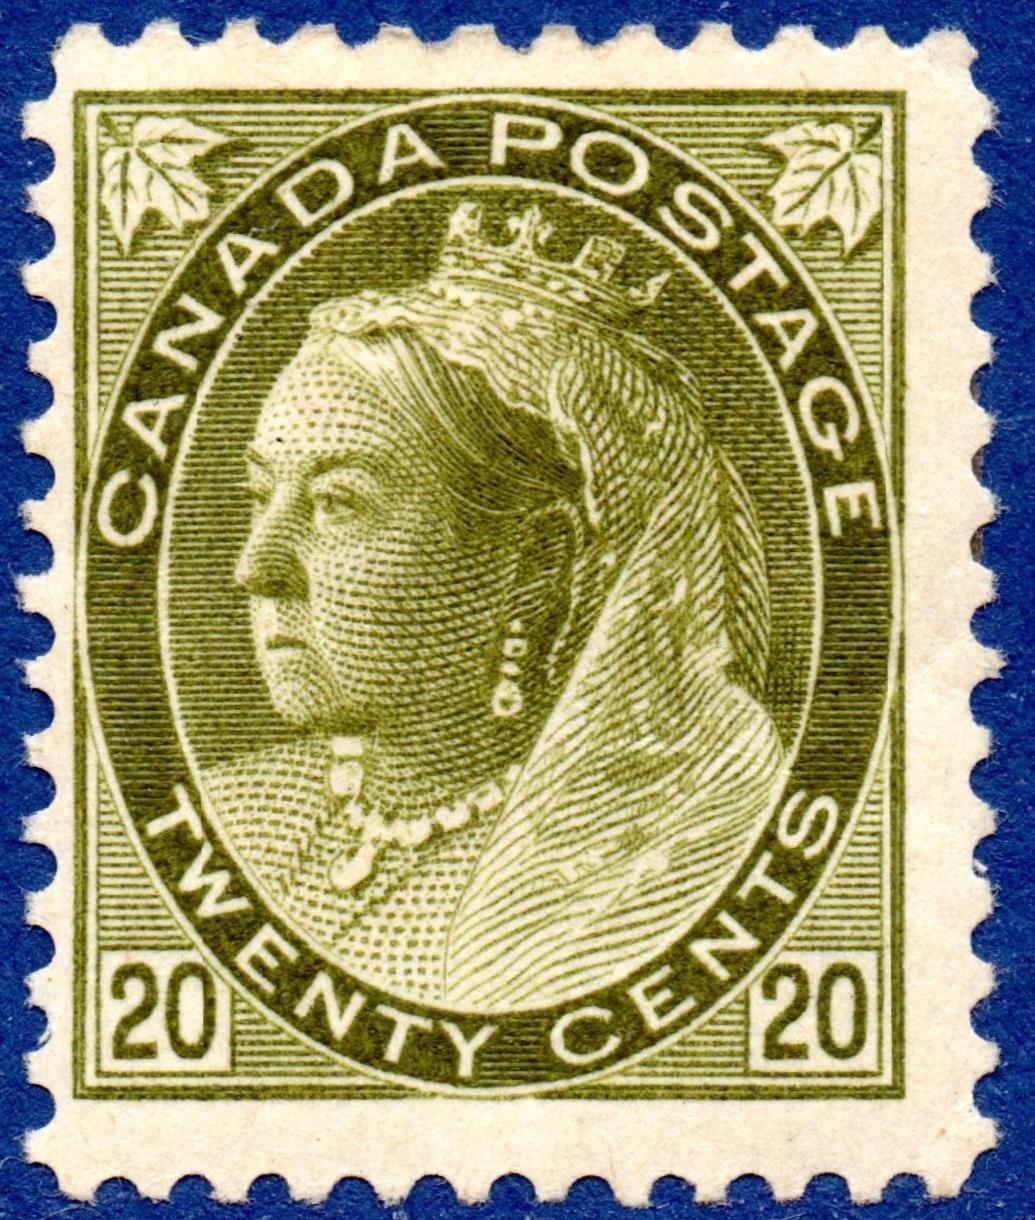 CANADA 1898 20c Olive Green Fine & Fresh Mounted Mint SG 165 Cat £300 -Scott #84